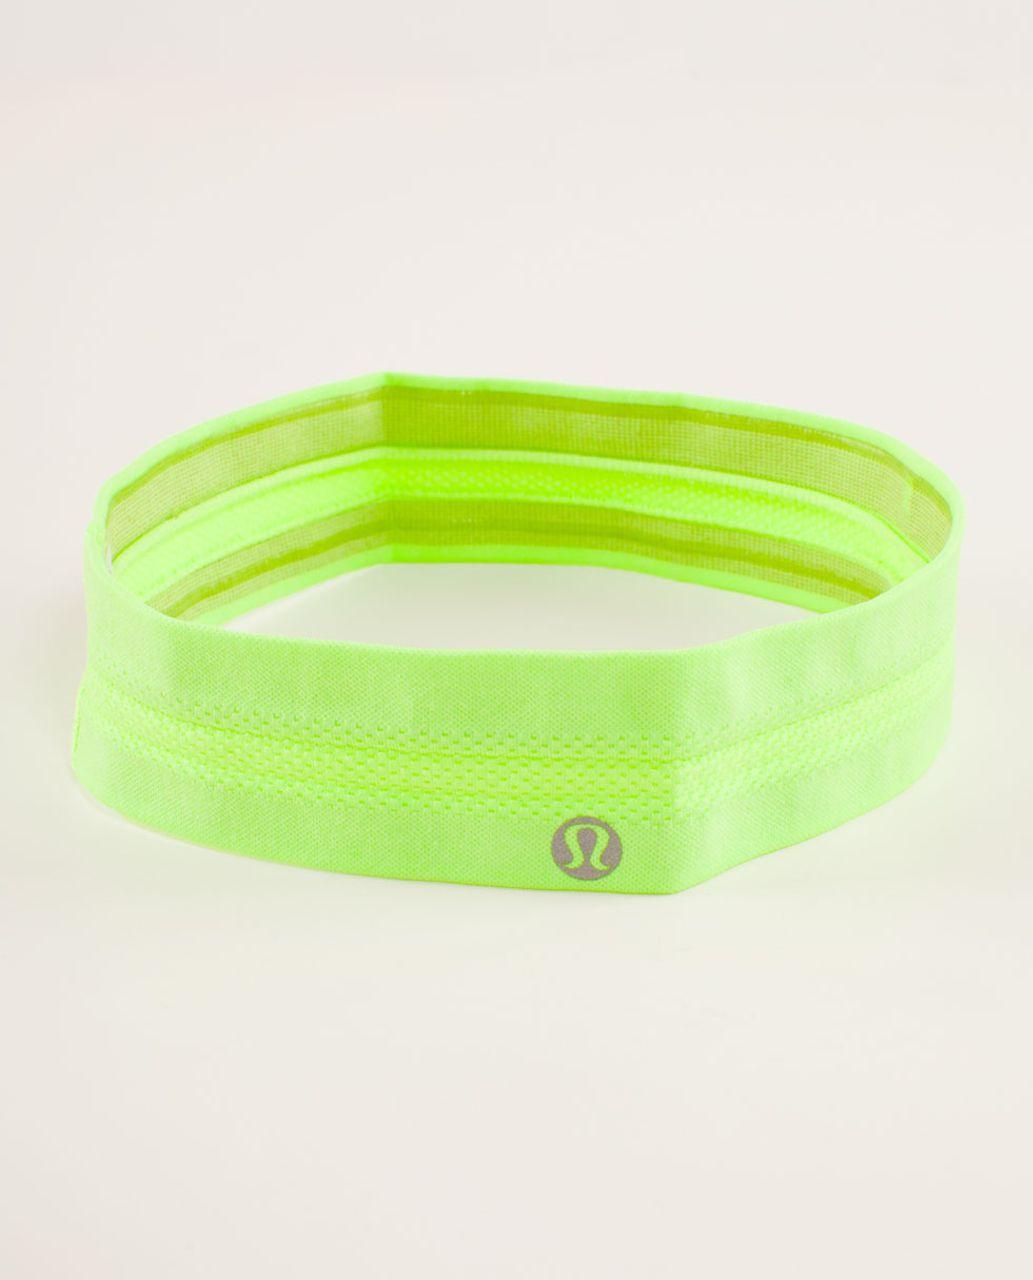 Lululemon Swiftly Headband - Zippy Green